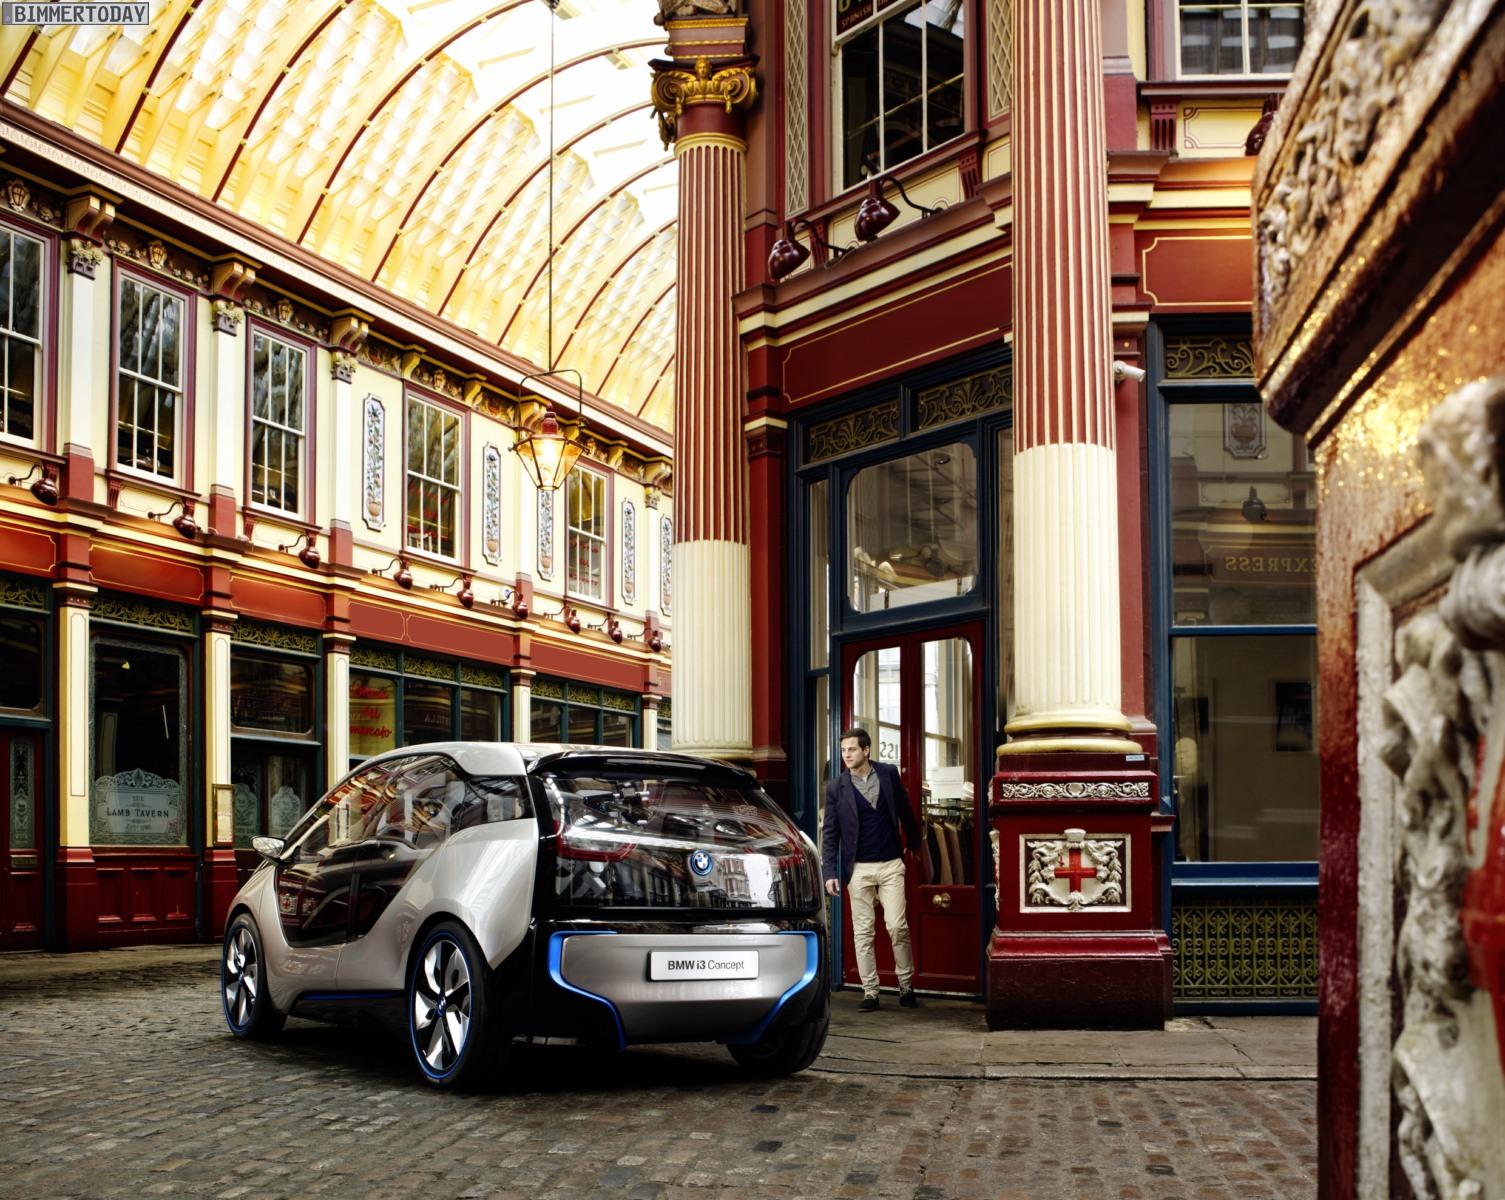 BMW i3 Concept Innenraum London 2012 011